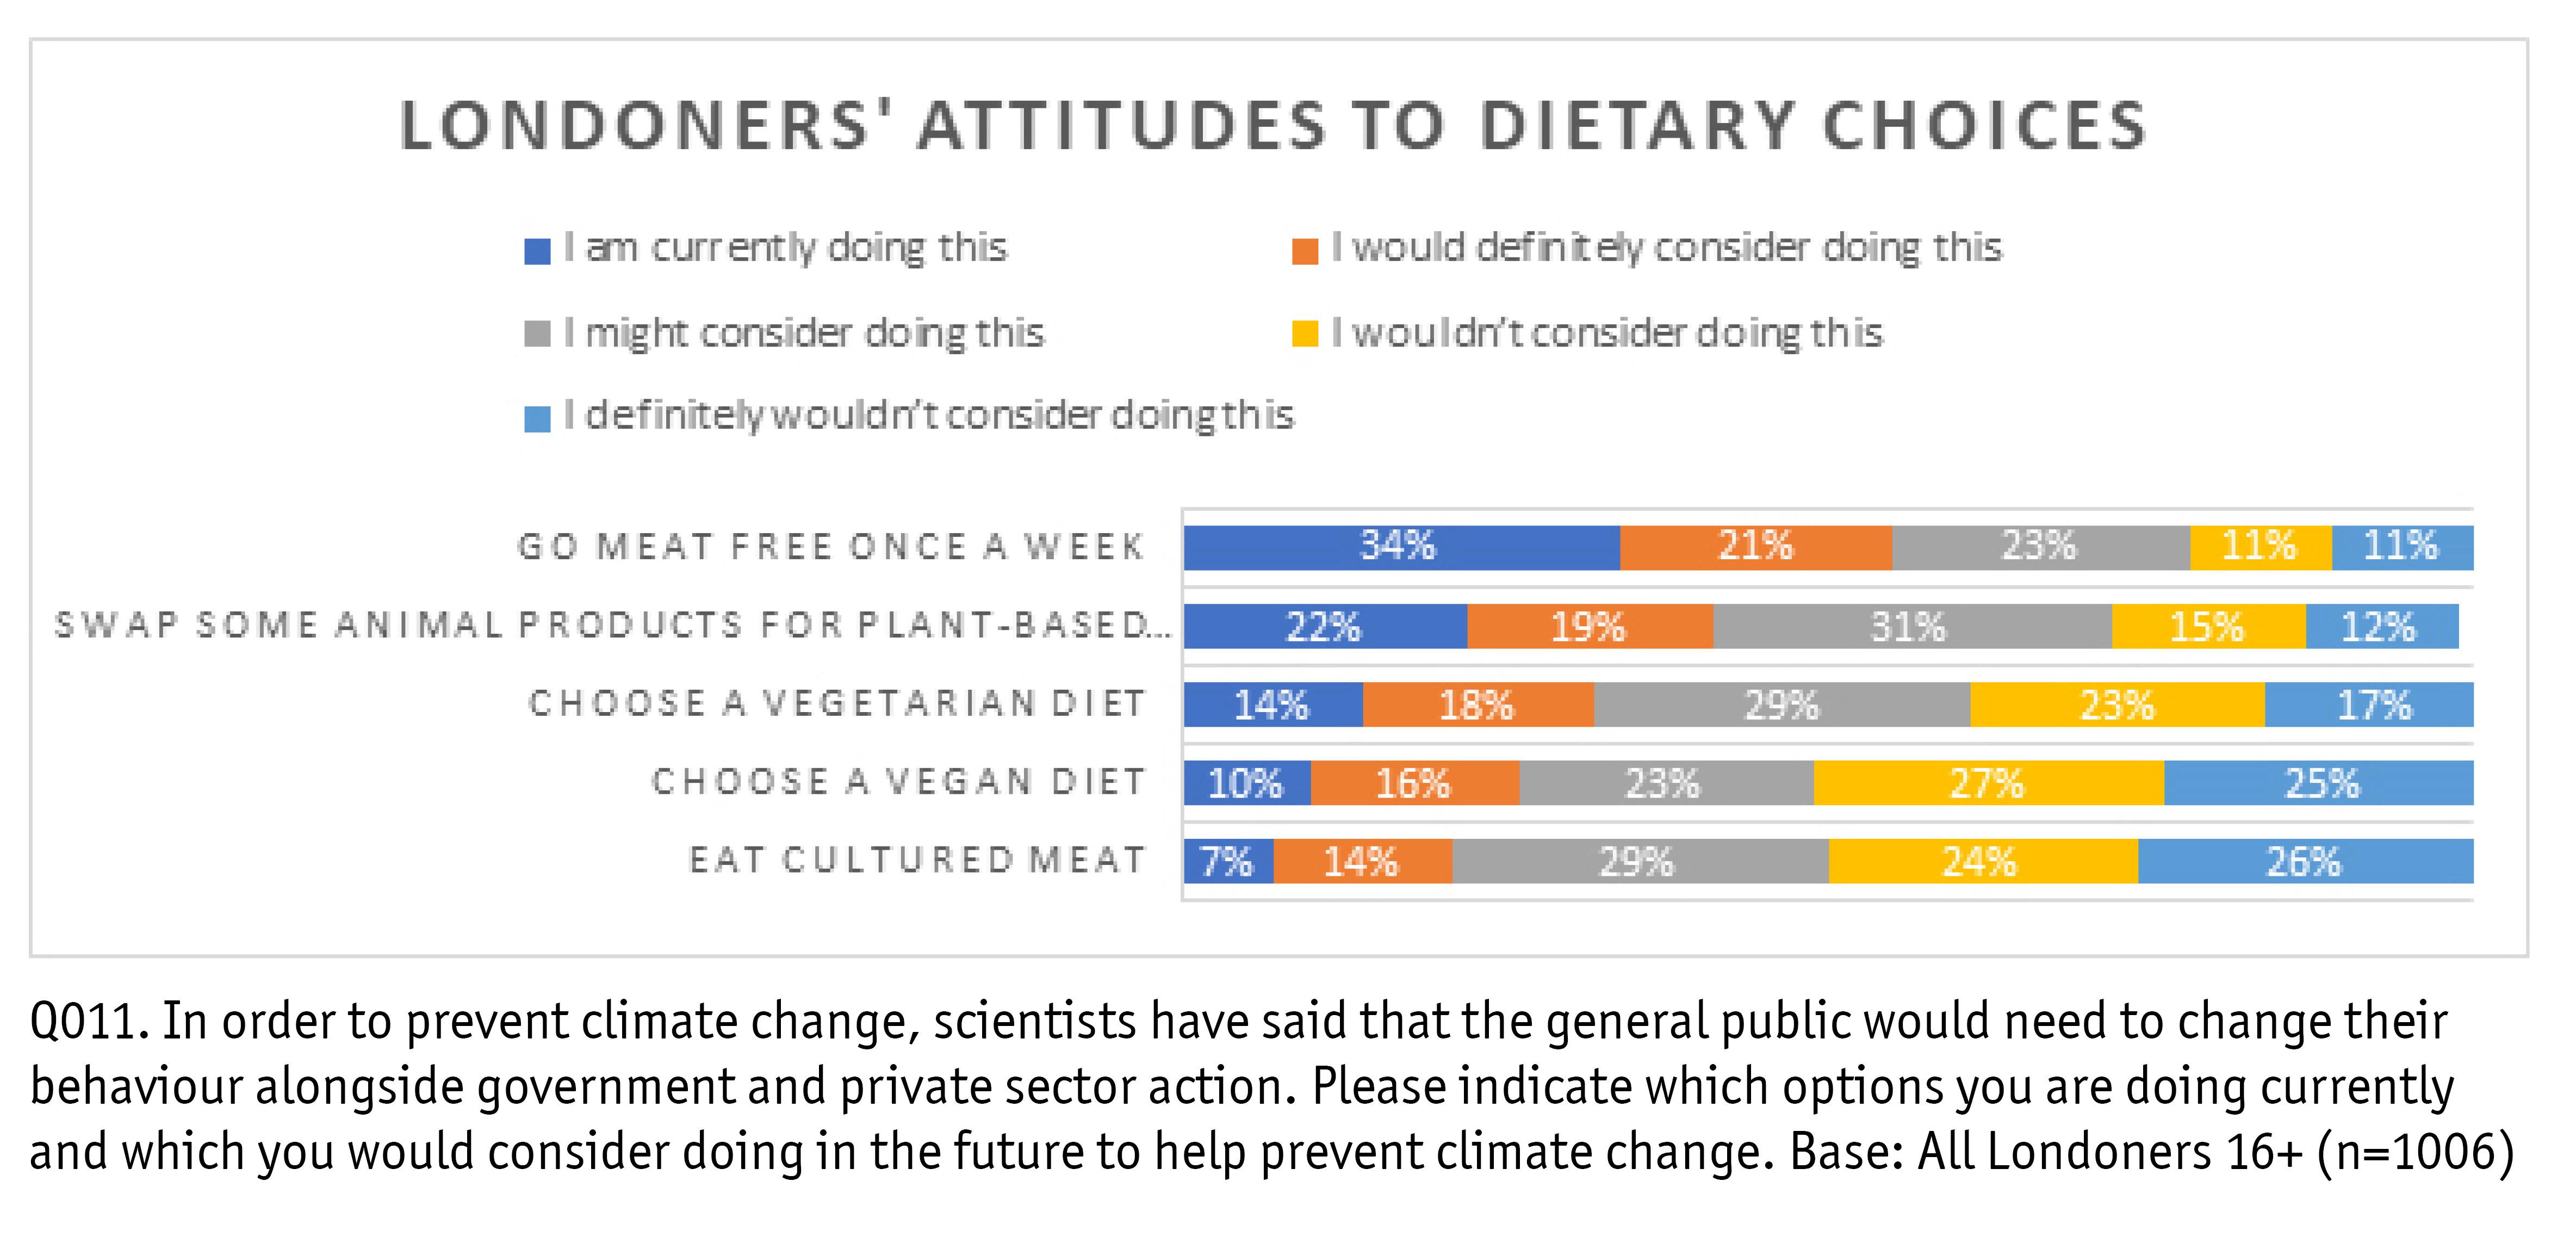 Attitudes to dietary choices